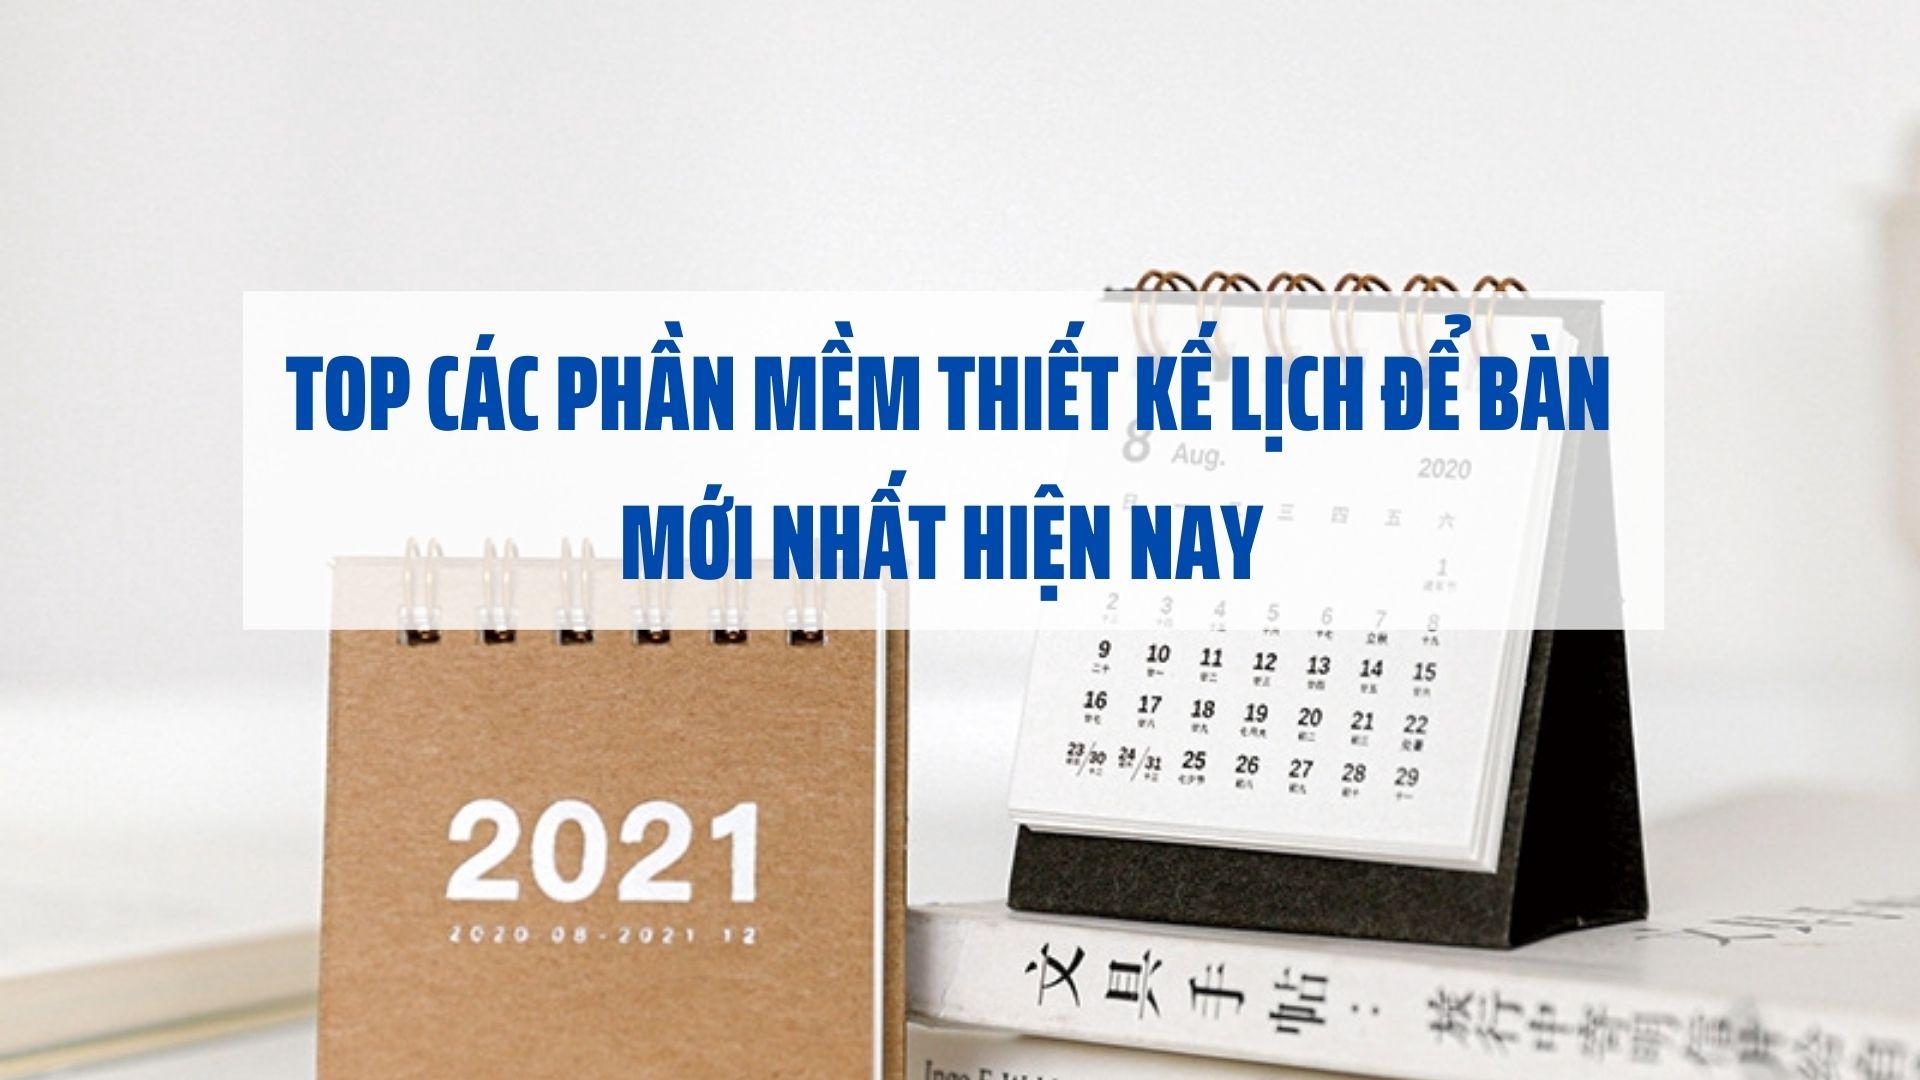 top-cac-phan-mem-thiet-ke-lich-de-ban-moi-nhat-hien-nay